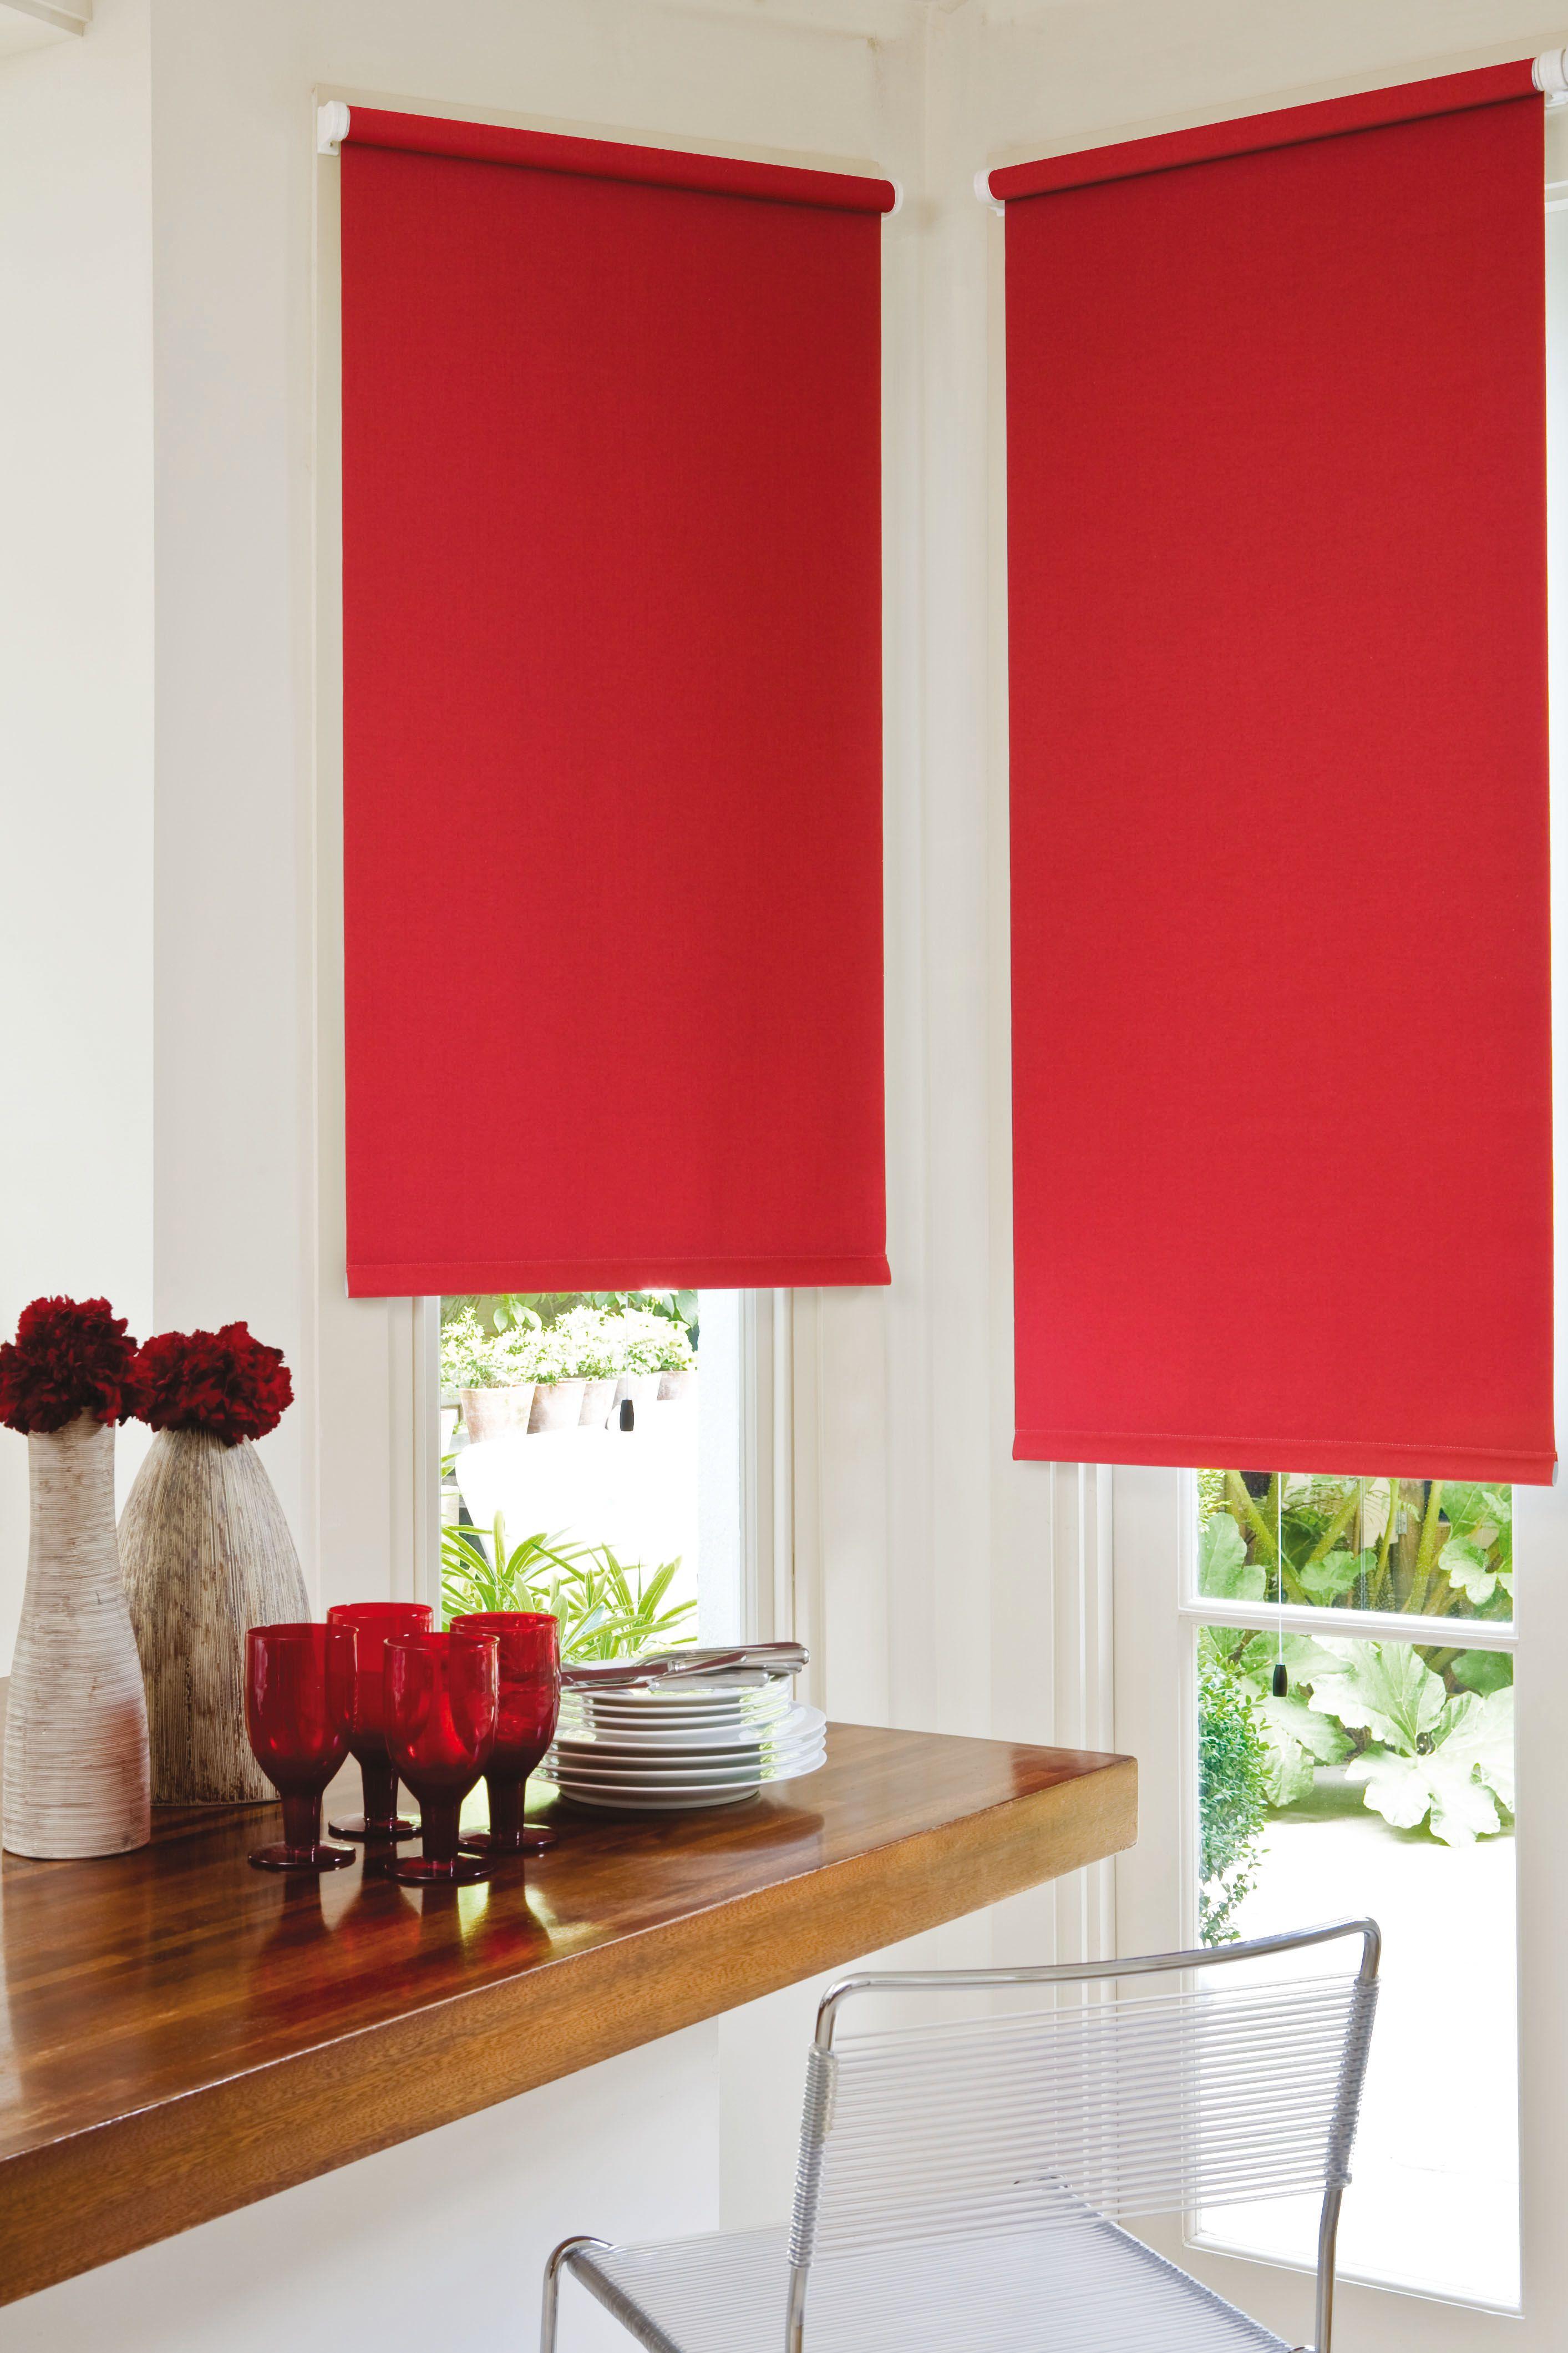 Roller blinds guesthouse pinterest kitchen curtains for Kitchen curtains and blinds